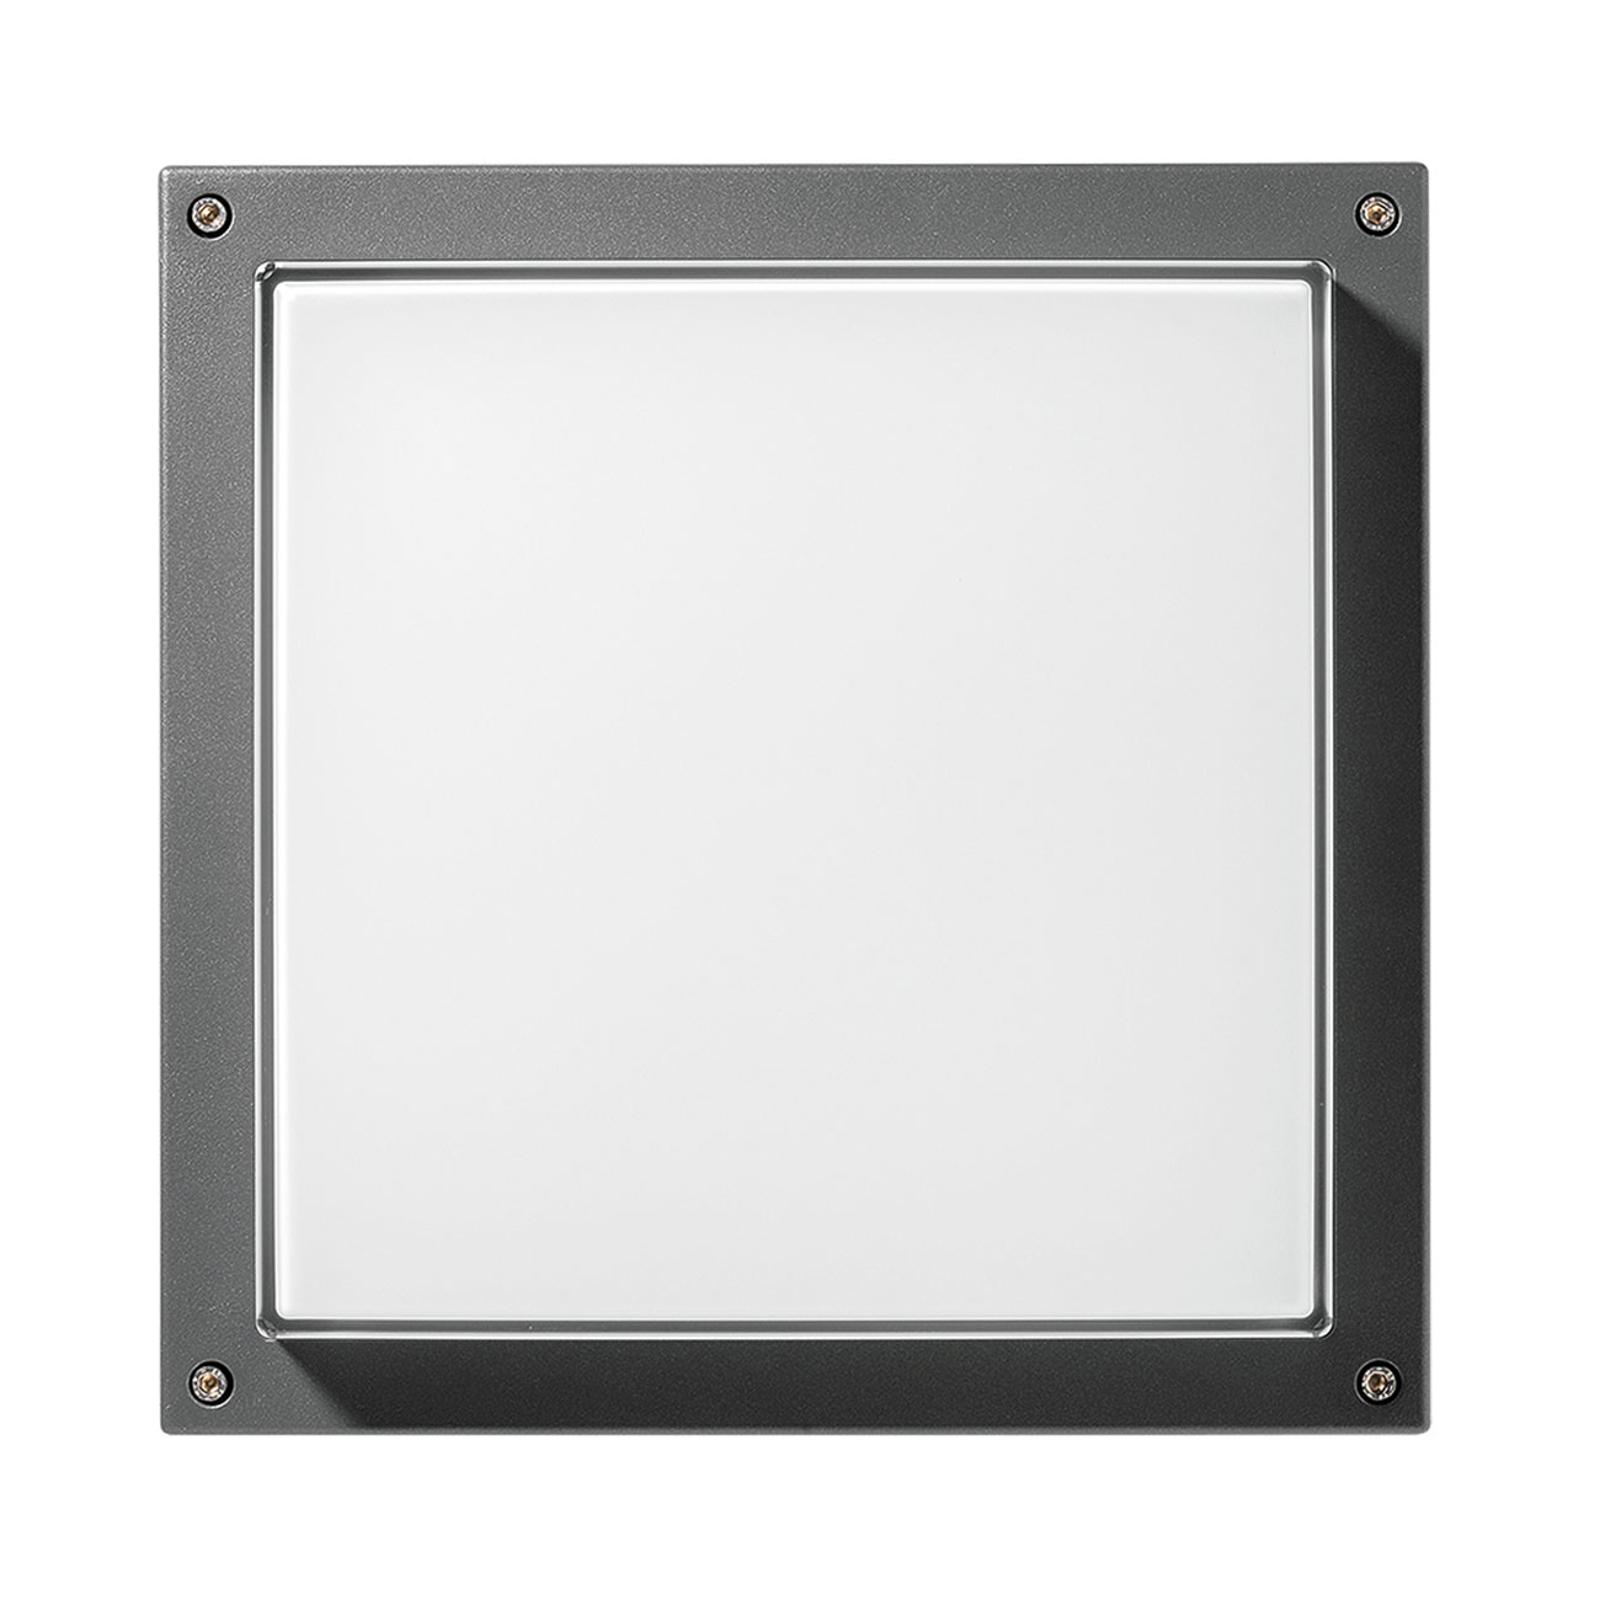 Applique Bliz Square 40 3000K anthracite dimmable